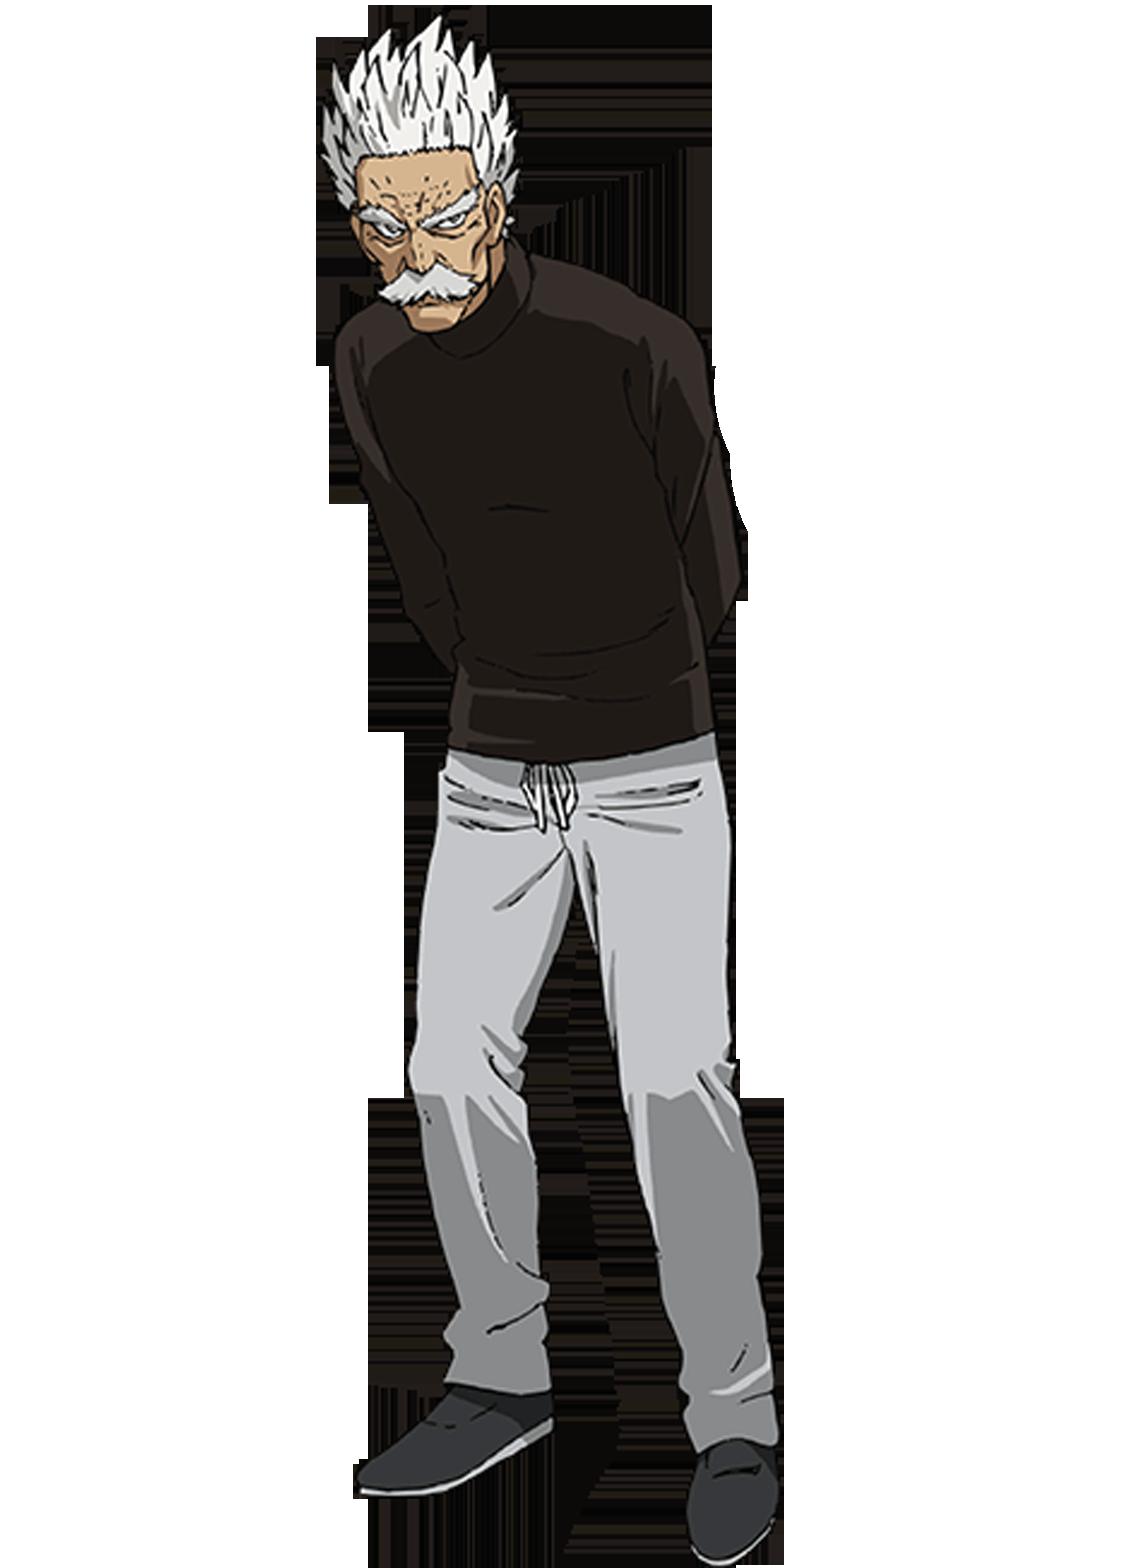 Ban Kosahiro